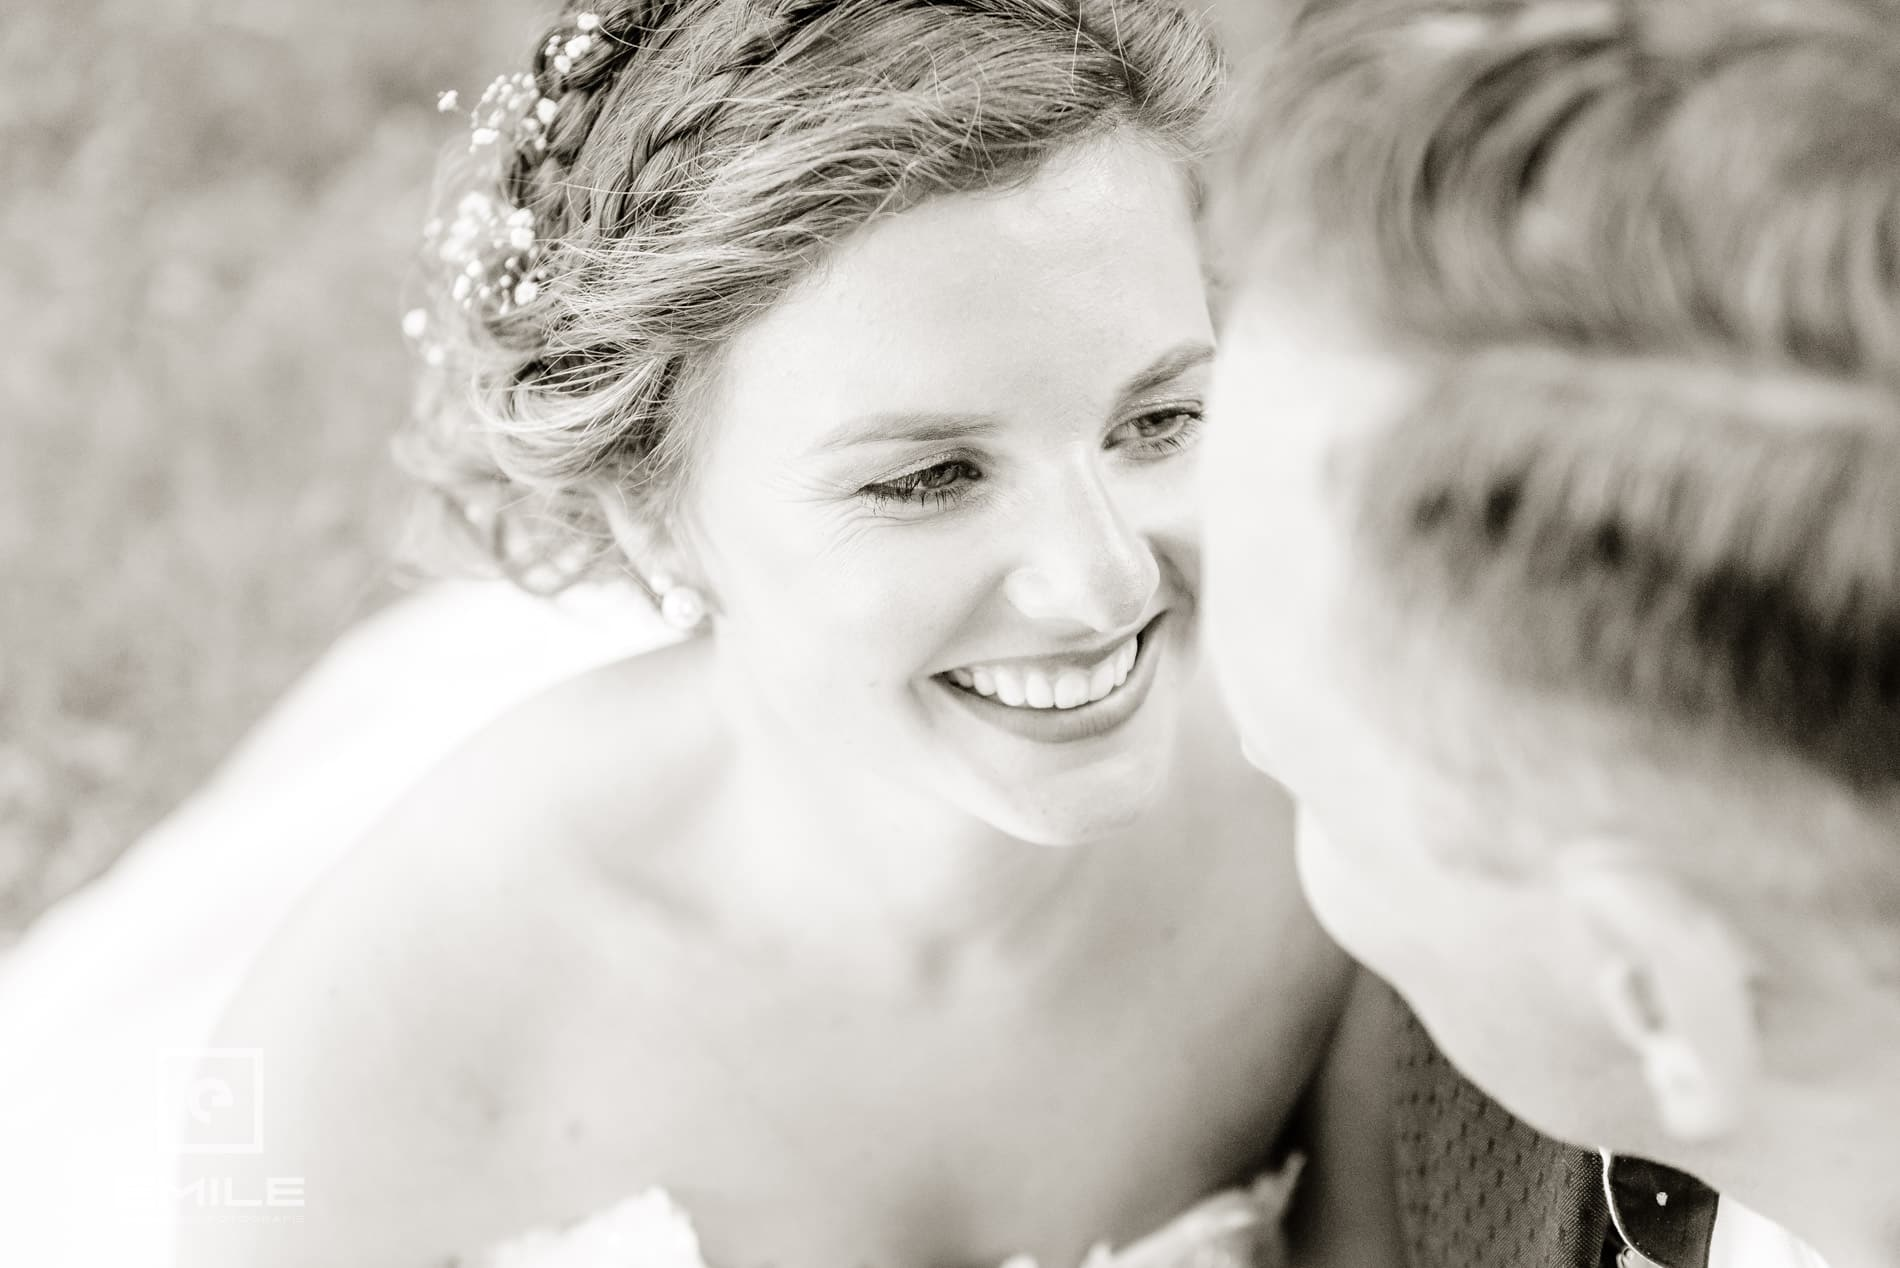 Close up van de bruid - Bruidsfotograaf Limburg - Kasteel Daelenbroeck - Herkenbosch